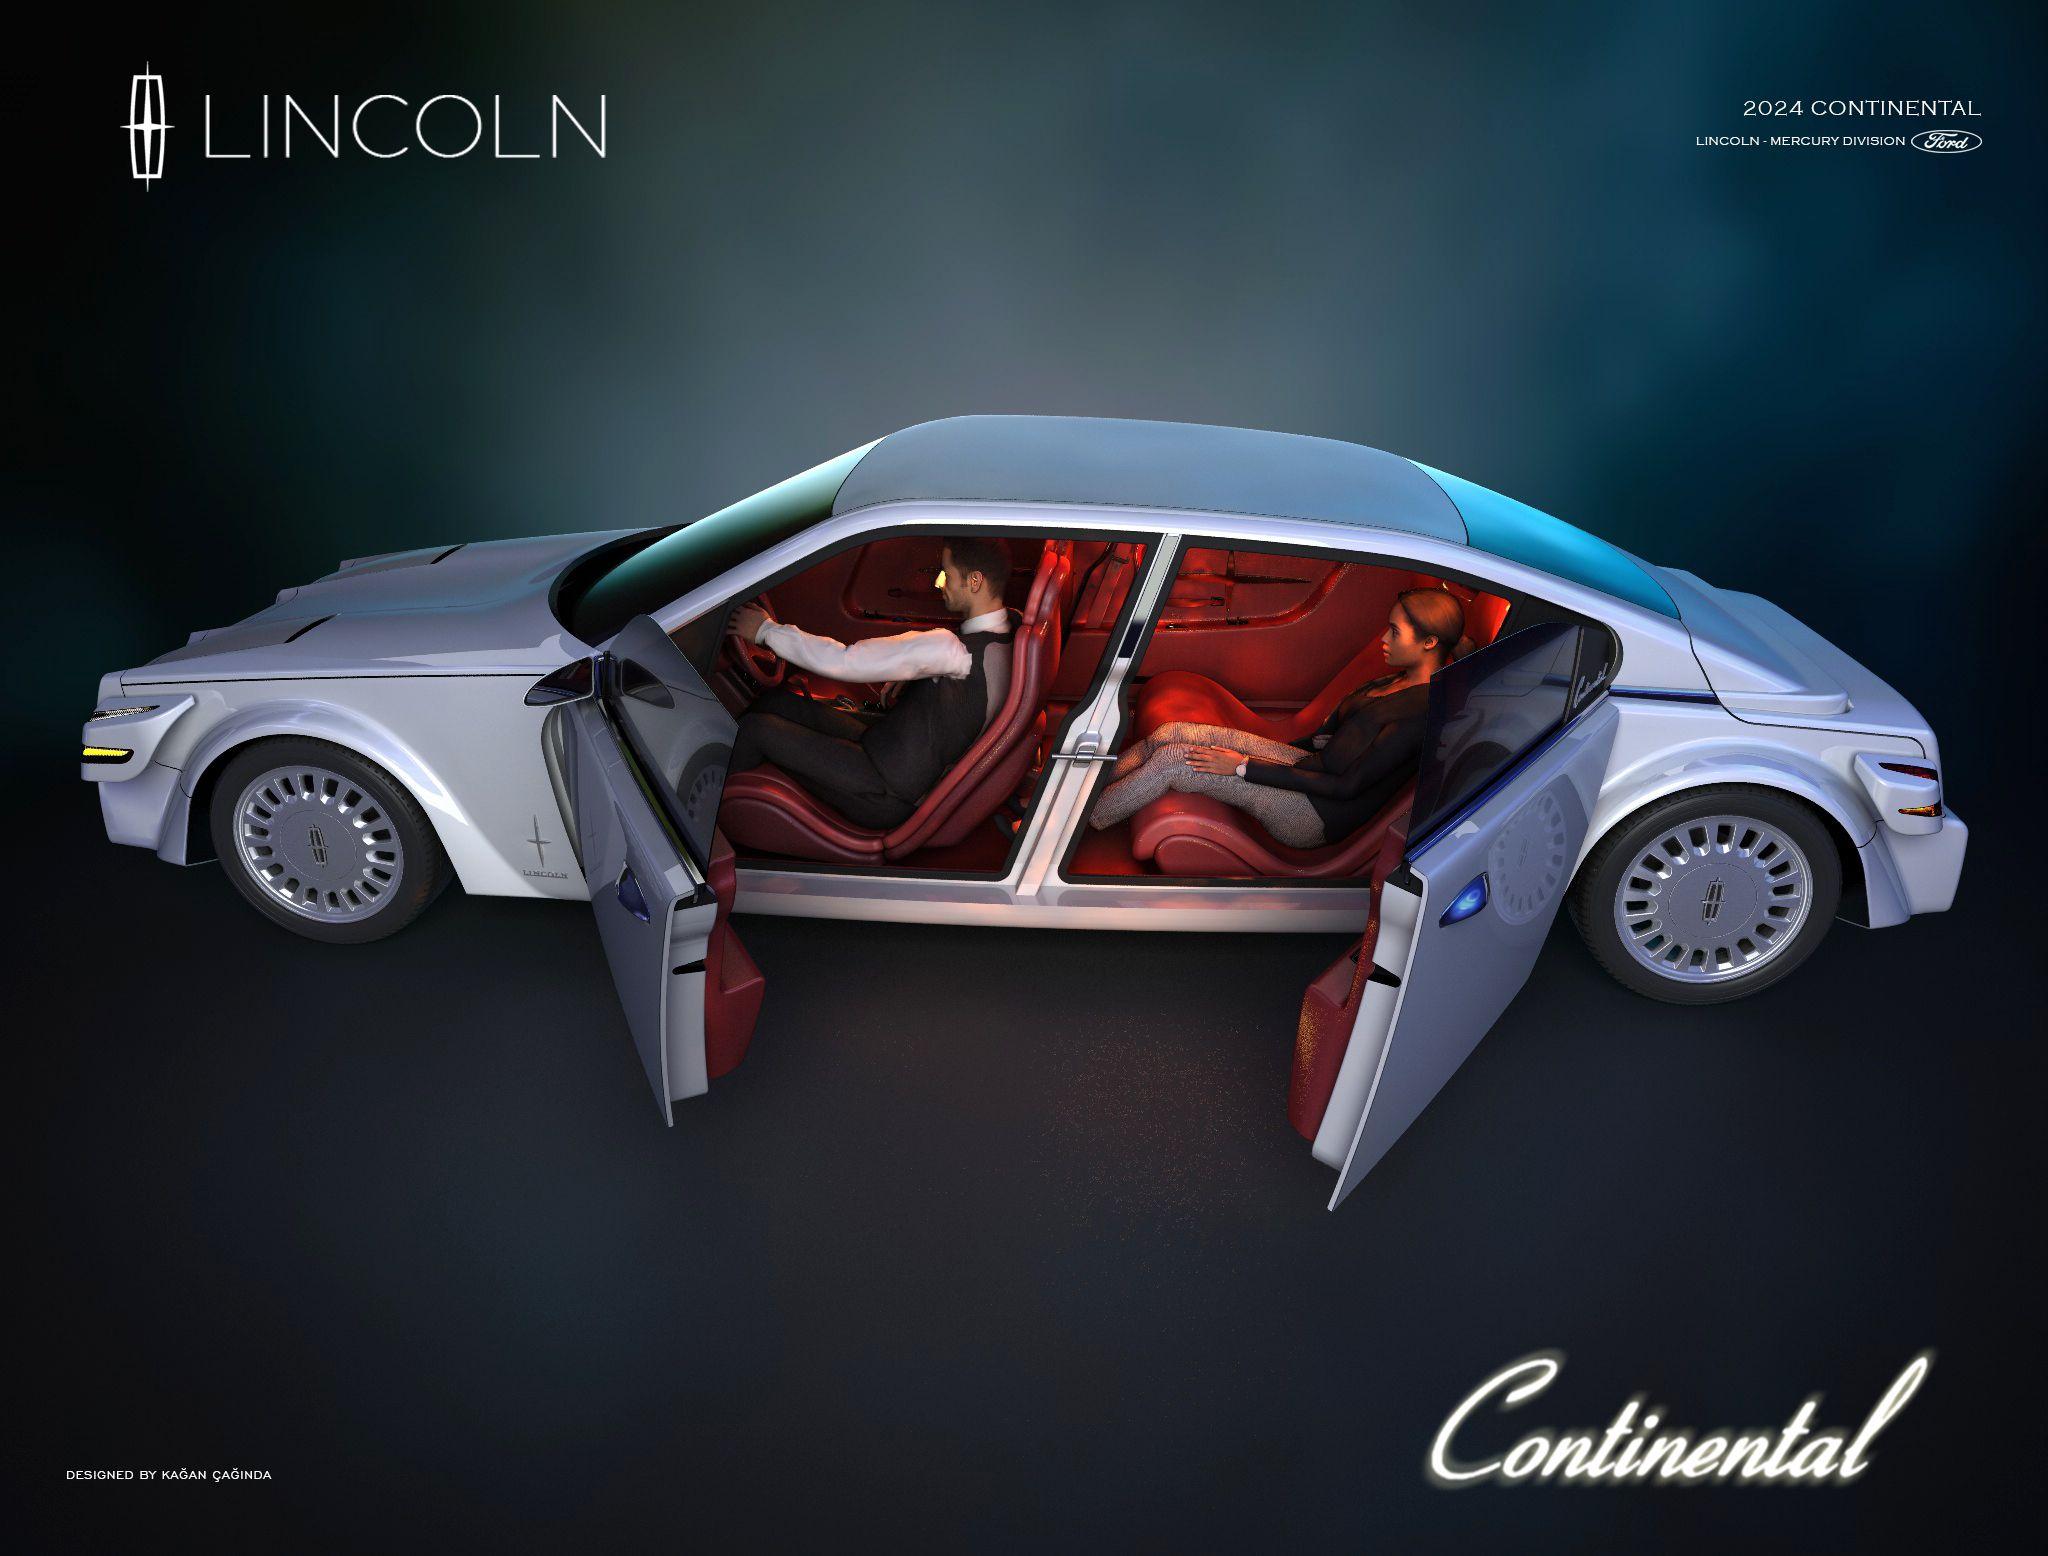 #autodesign #cardesignpro #classiccars #carporn #alfaromeo #productdesign #hypercar #instacar #ferrari #v #s #cardesignru #mercedes #c #d #carbodydesign #illustration #cardesigning #bmw #cardesignconcept #dise #carsketching #rendering #cardesignnews #cardesigns #render #conceptdesign #drawtodrive #doodle #cardesignerscommunity #abrahamlincoln #impala #history #traditionalluxurycar #car #photography #classiccar #art #omaha #chevy #lincolnnebraska #doncaster #linc #bmw #edit #mercury #chrysler